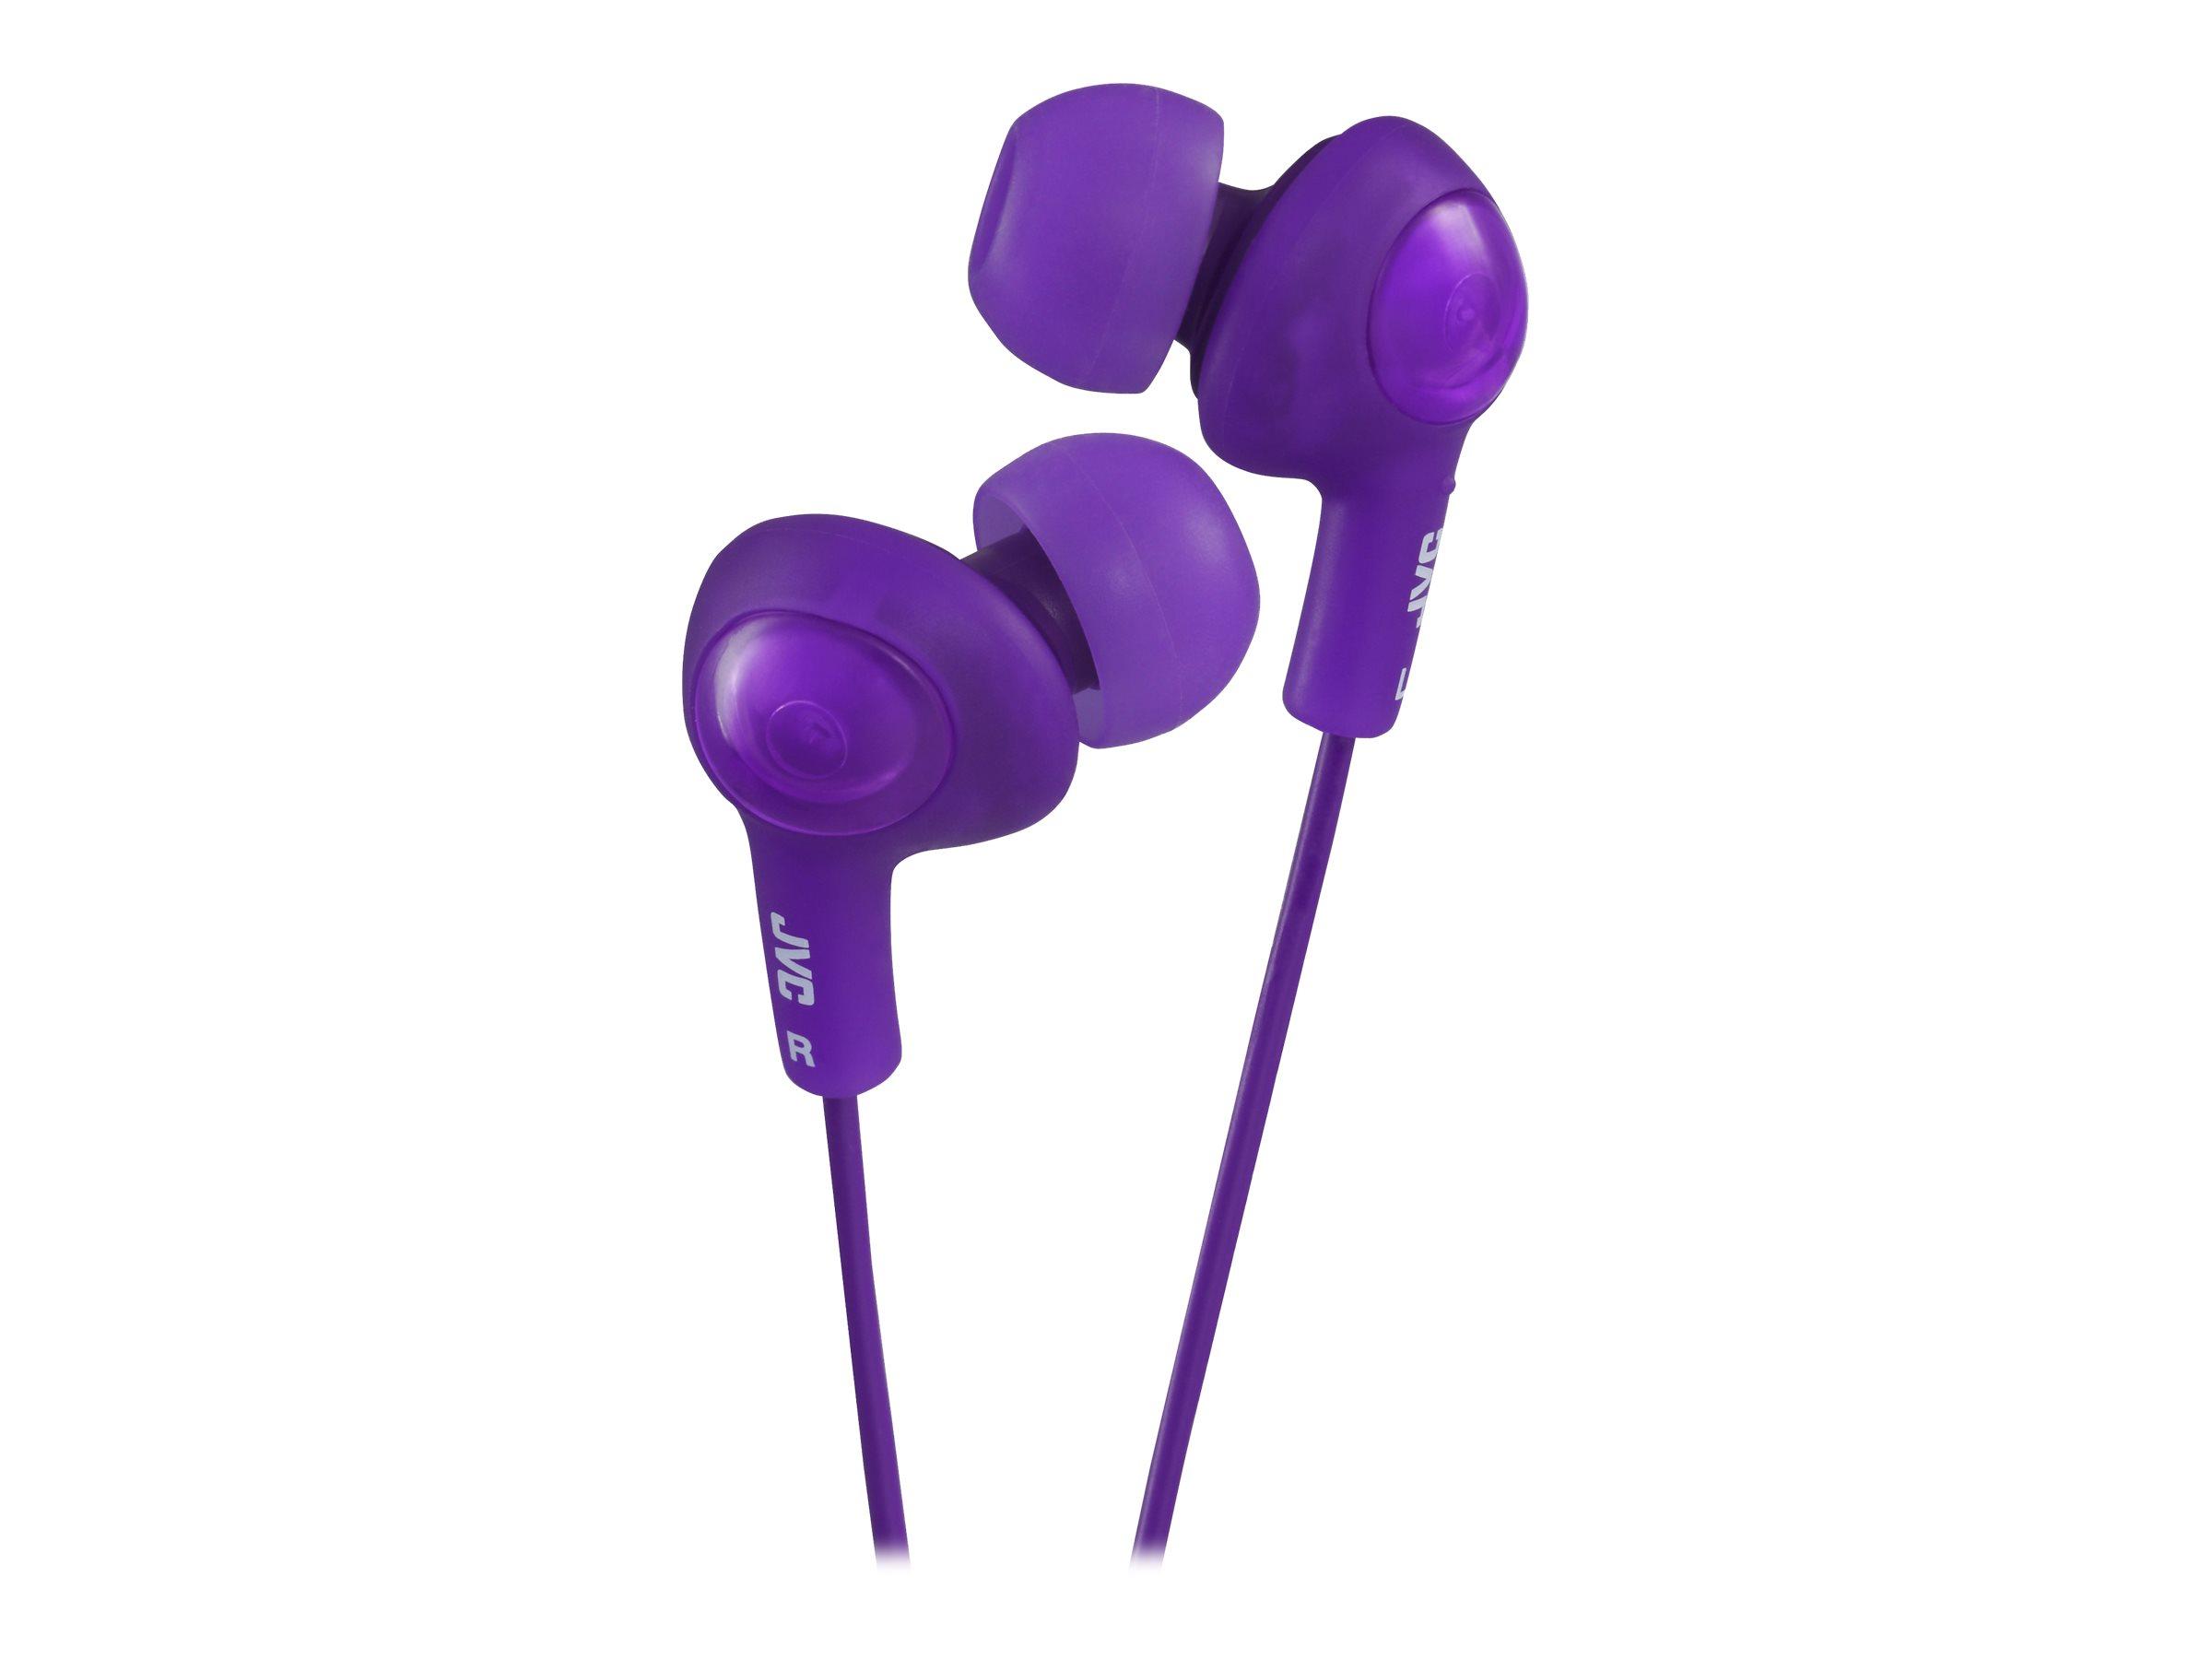 Image for Jvc Ha-Fx5-V Gumy Plus Phones - Earphones from Circuit City